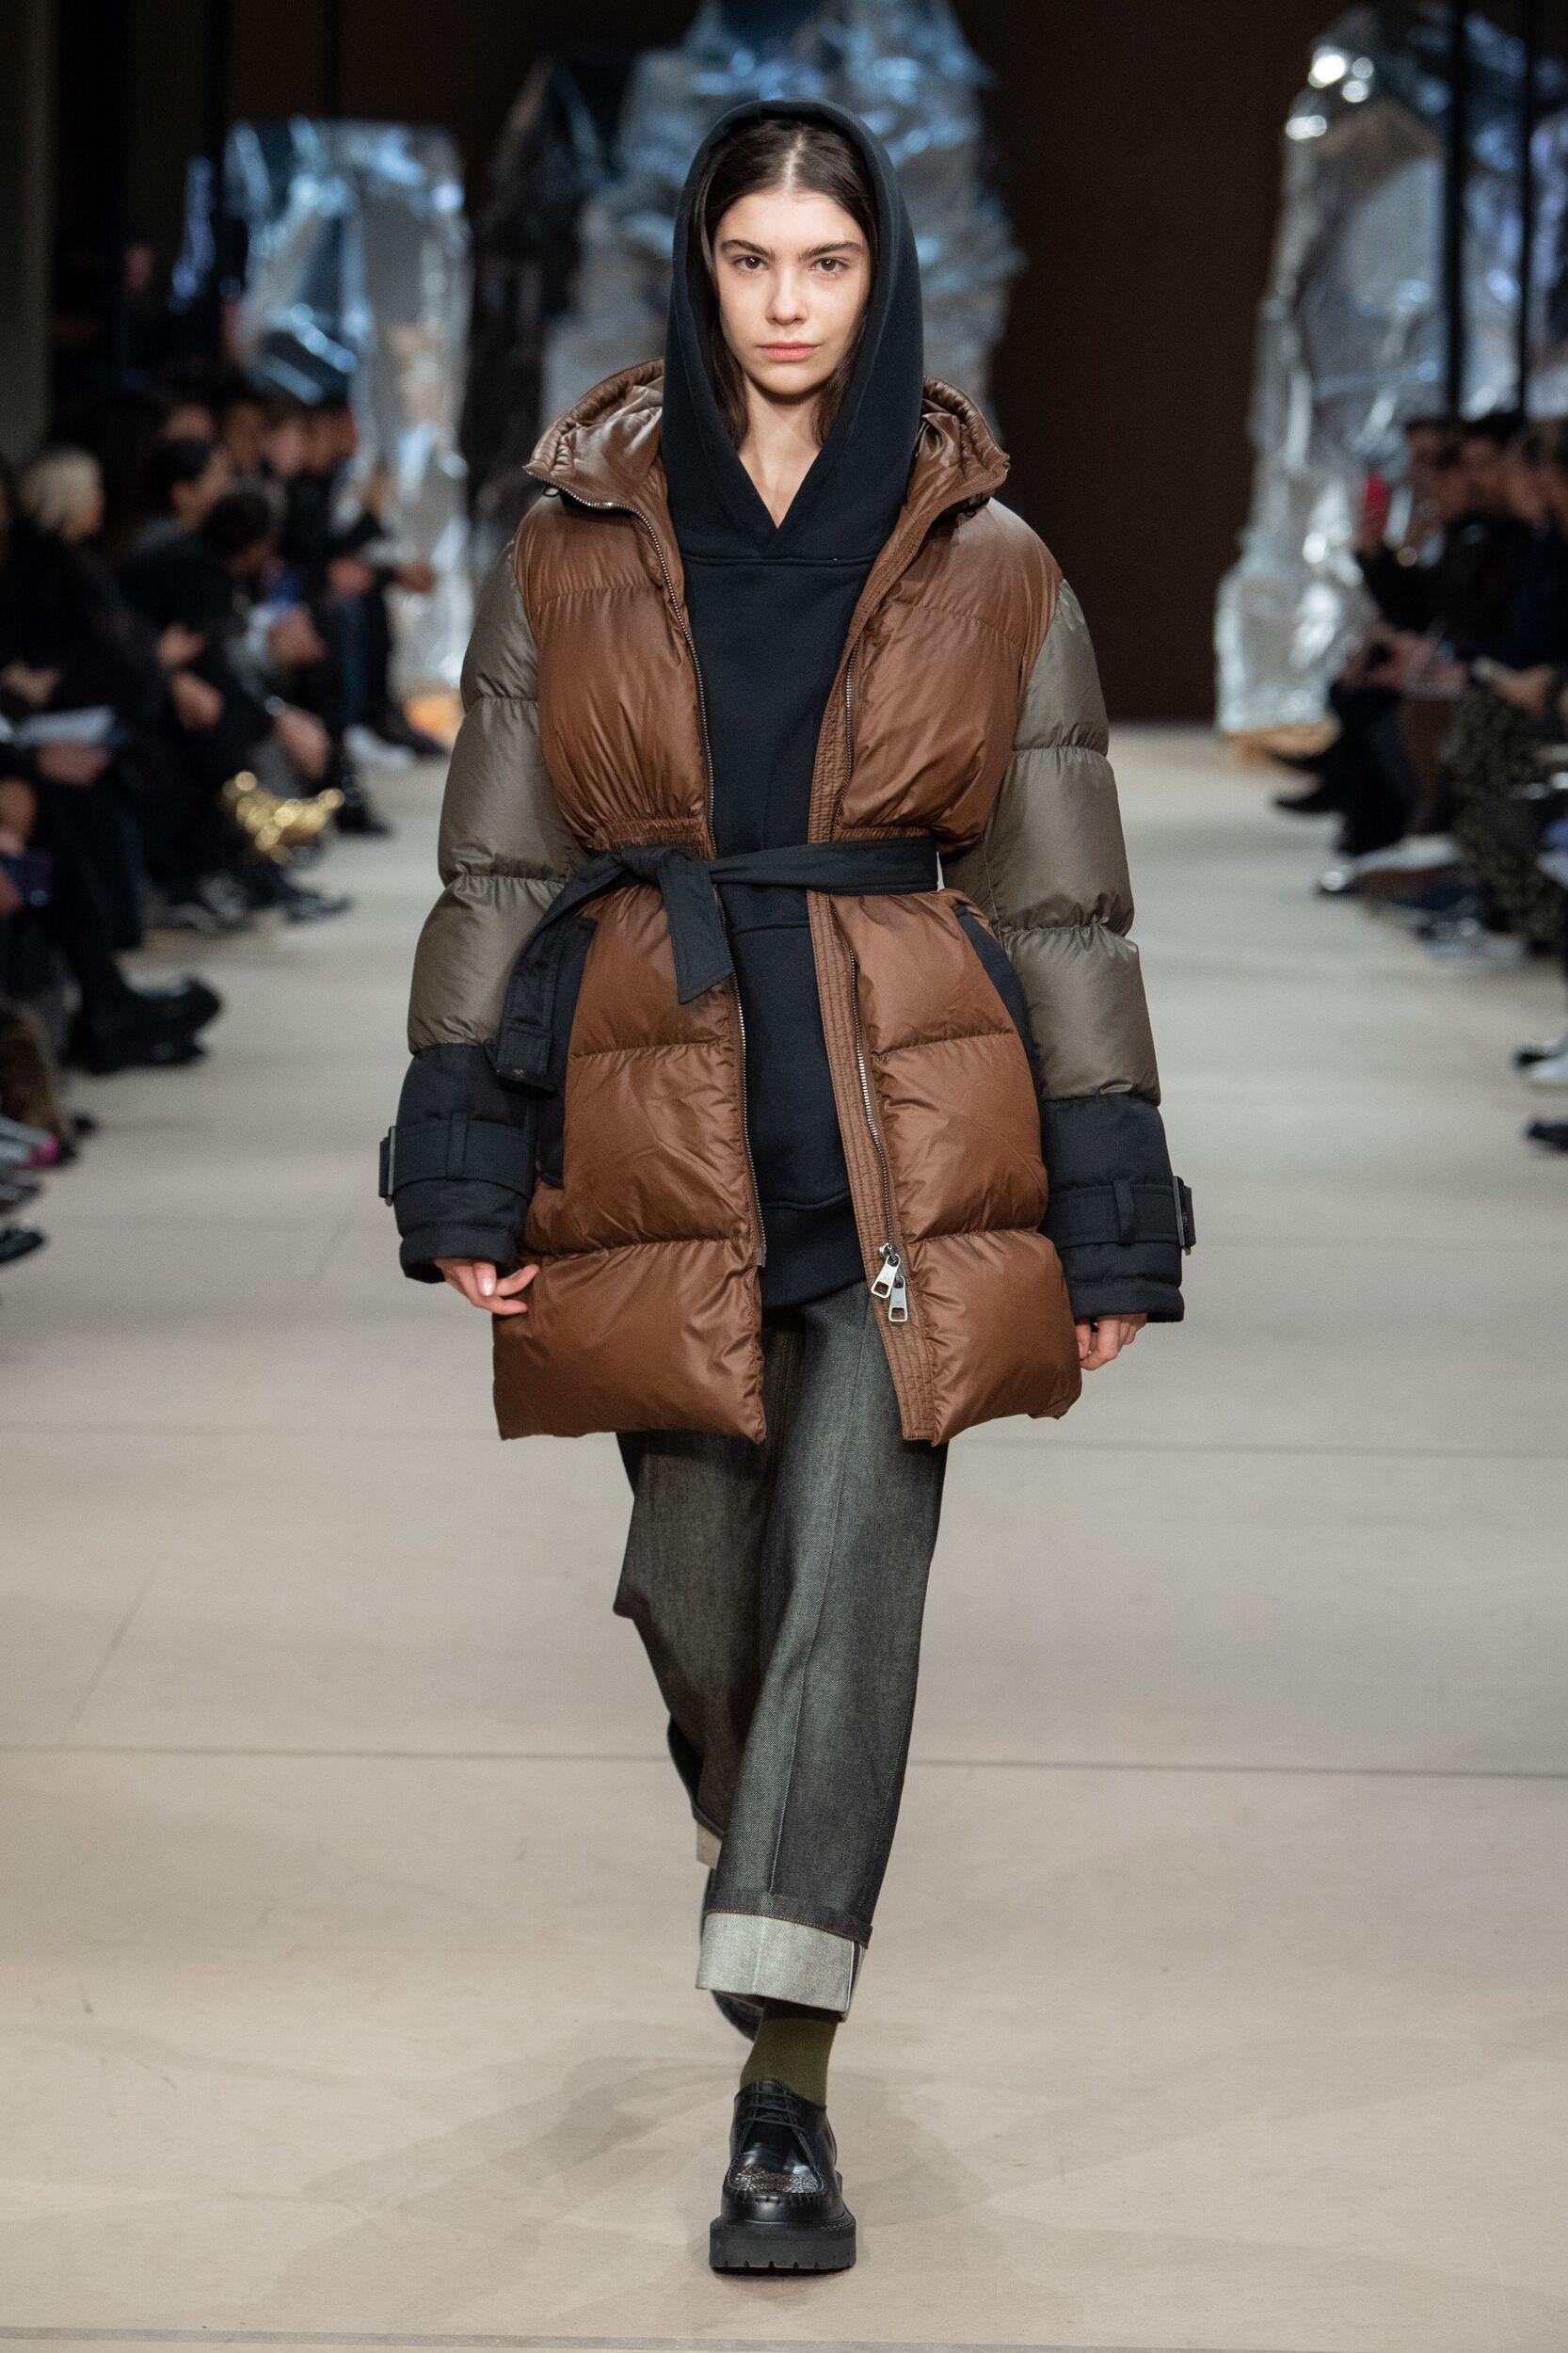 2020 Neil Barrett Catwalk Milan Fashion Week